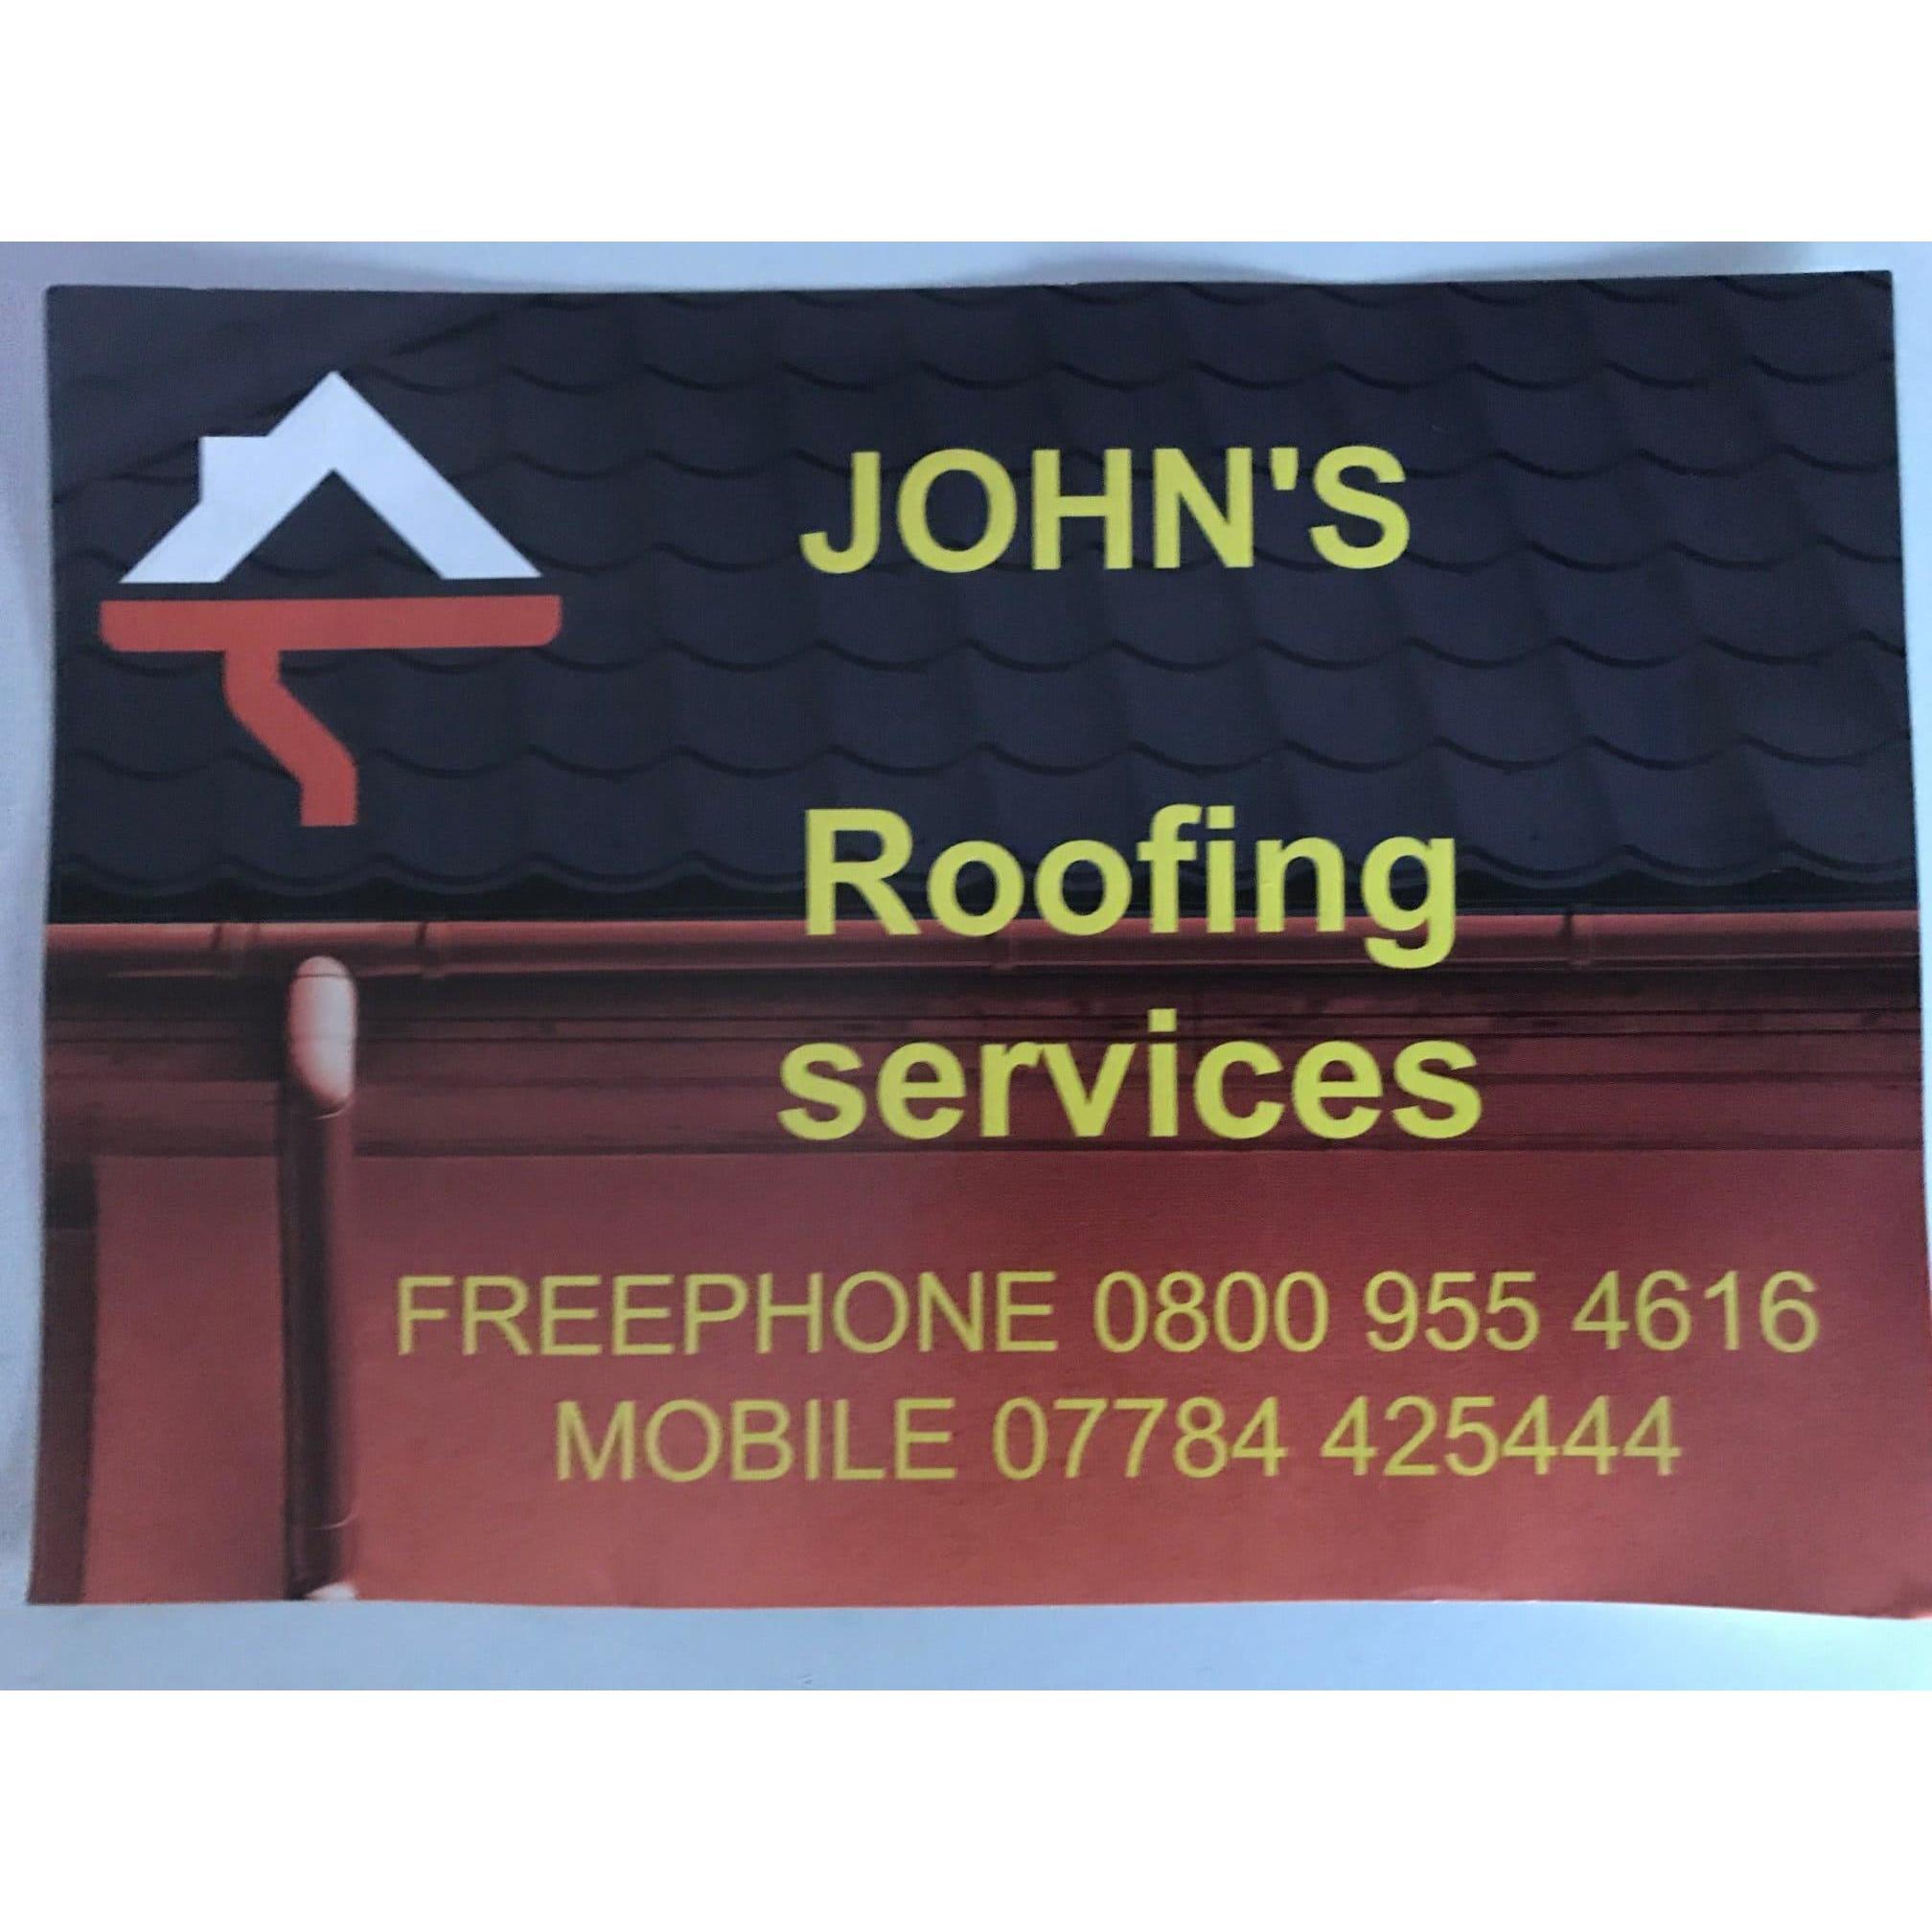 John's Roofing Services - Clitheroe, Lancashire BB7 9EX - 08009 554616 | ShowMeLocal.com